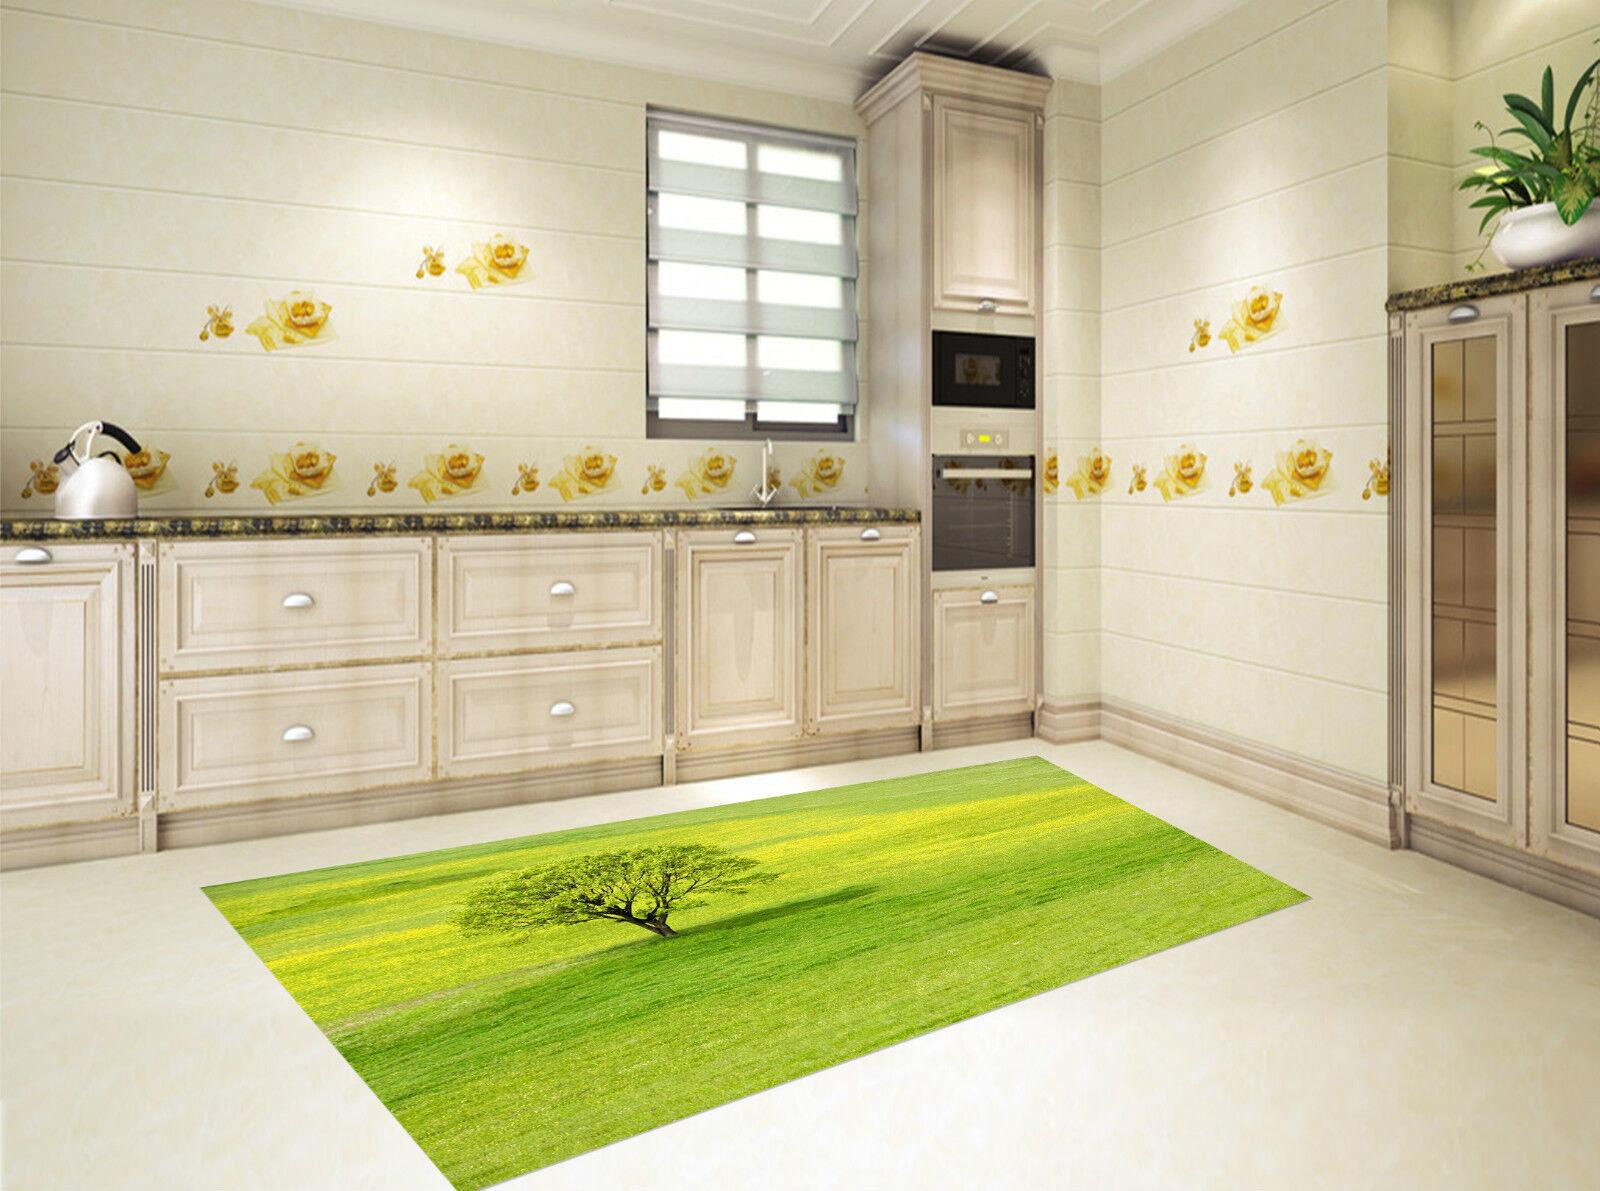 3D Arbre Herbe Verte 201 Décor Mural Murale De Mur Cuisine De Cuisine Mur AJ WALLPAPER FR 62f8e8